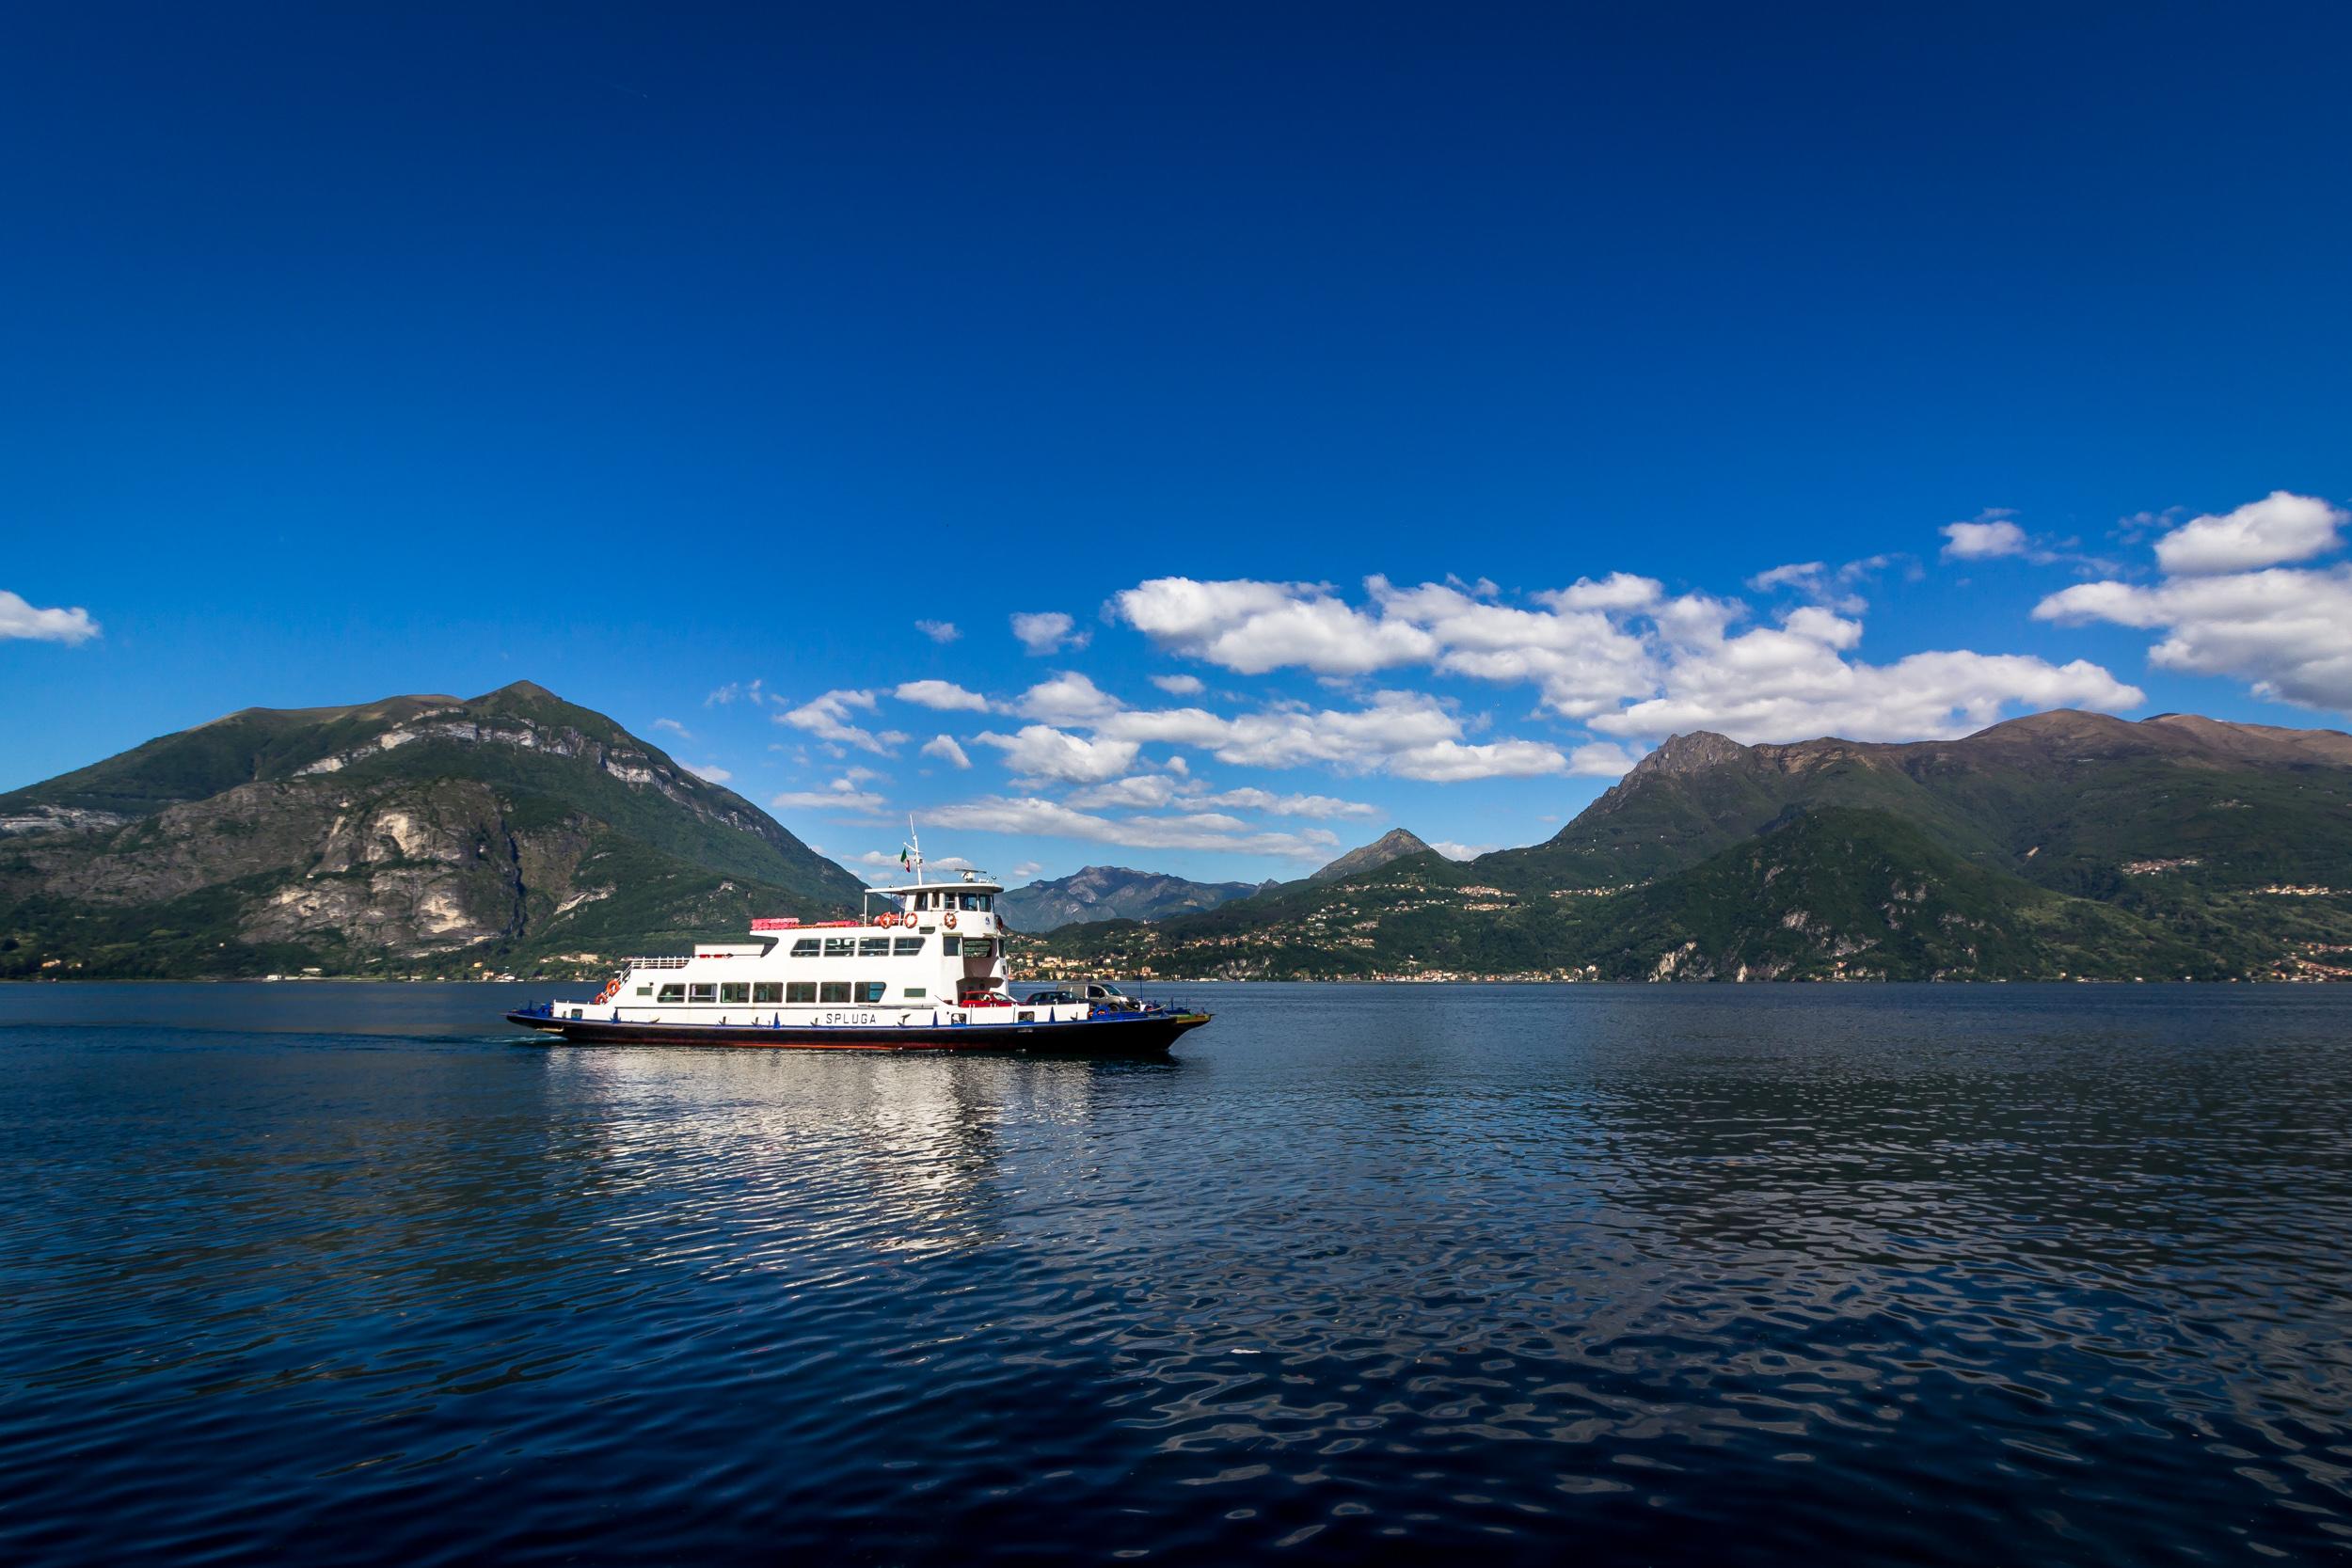 A Ferry named Spluga